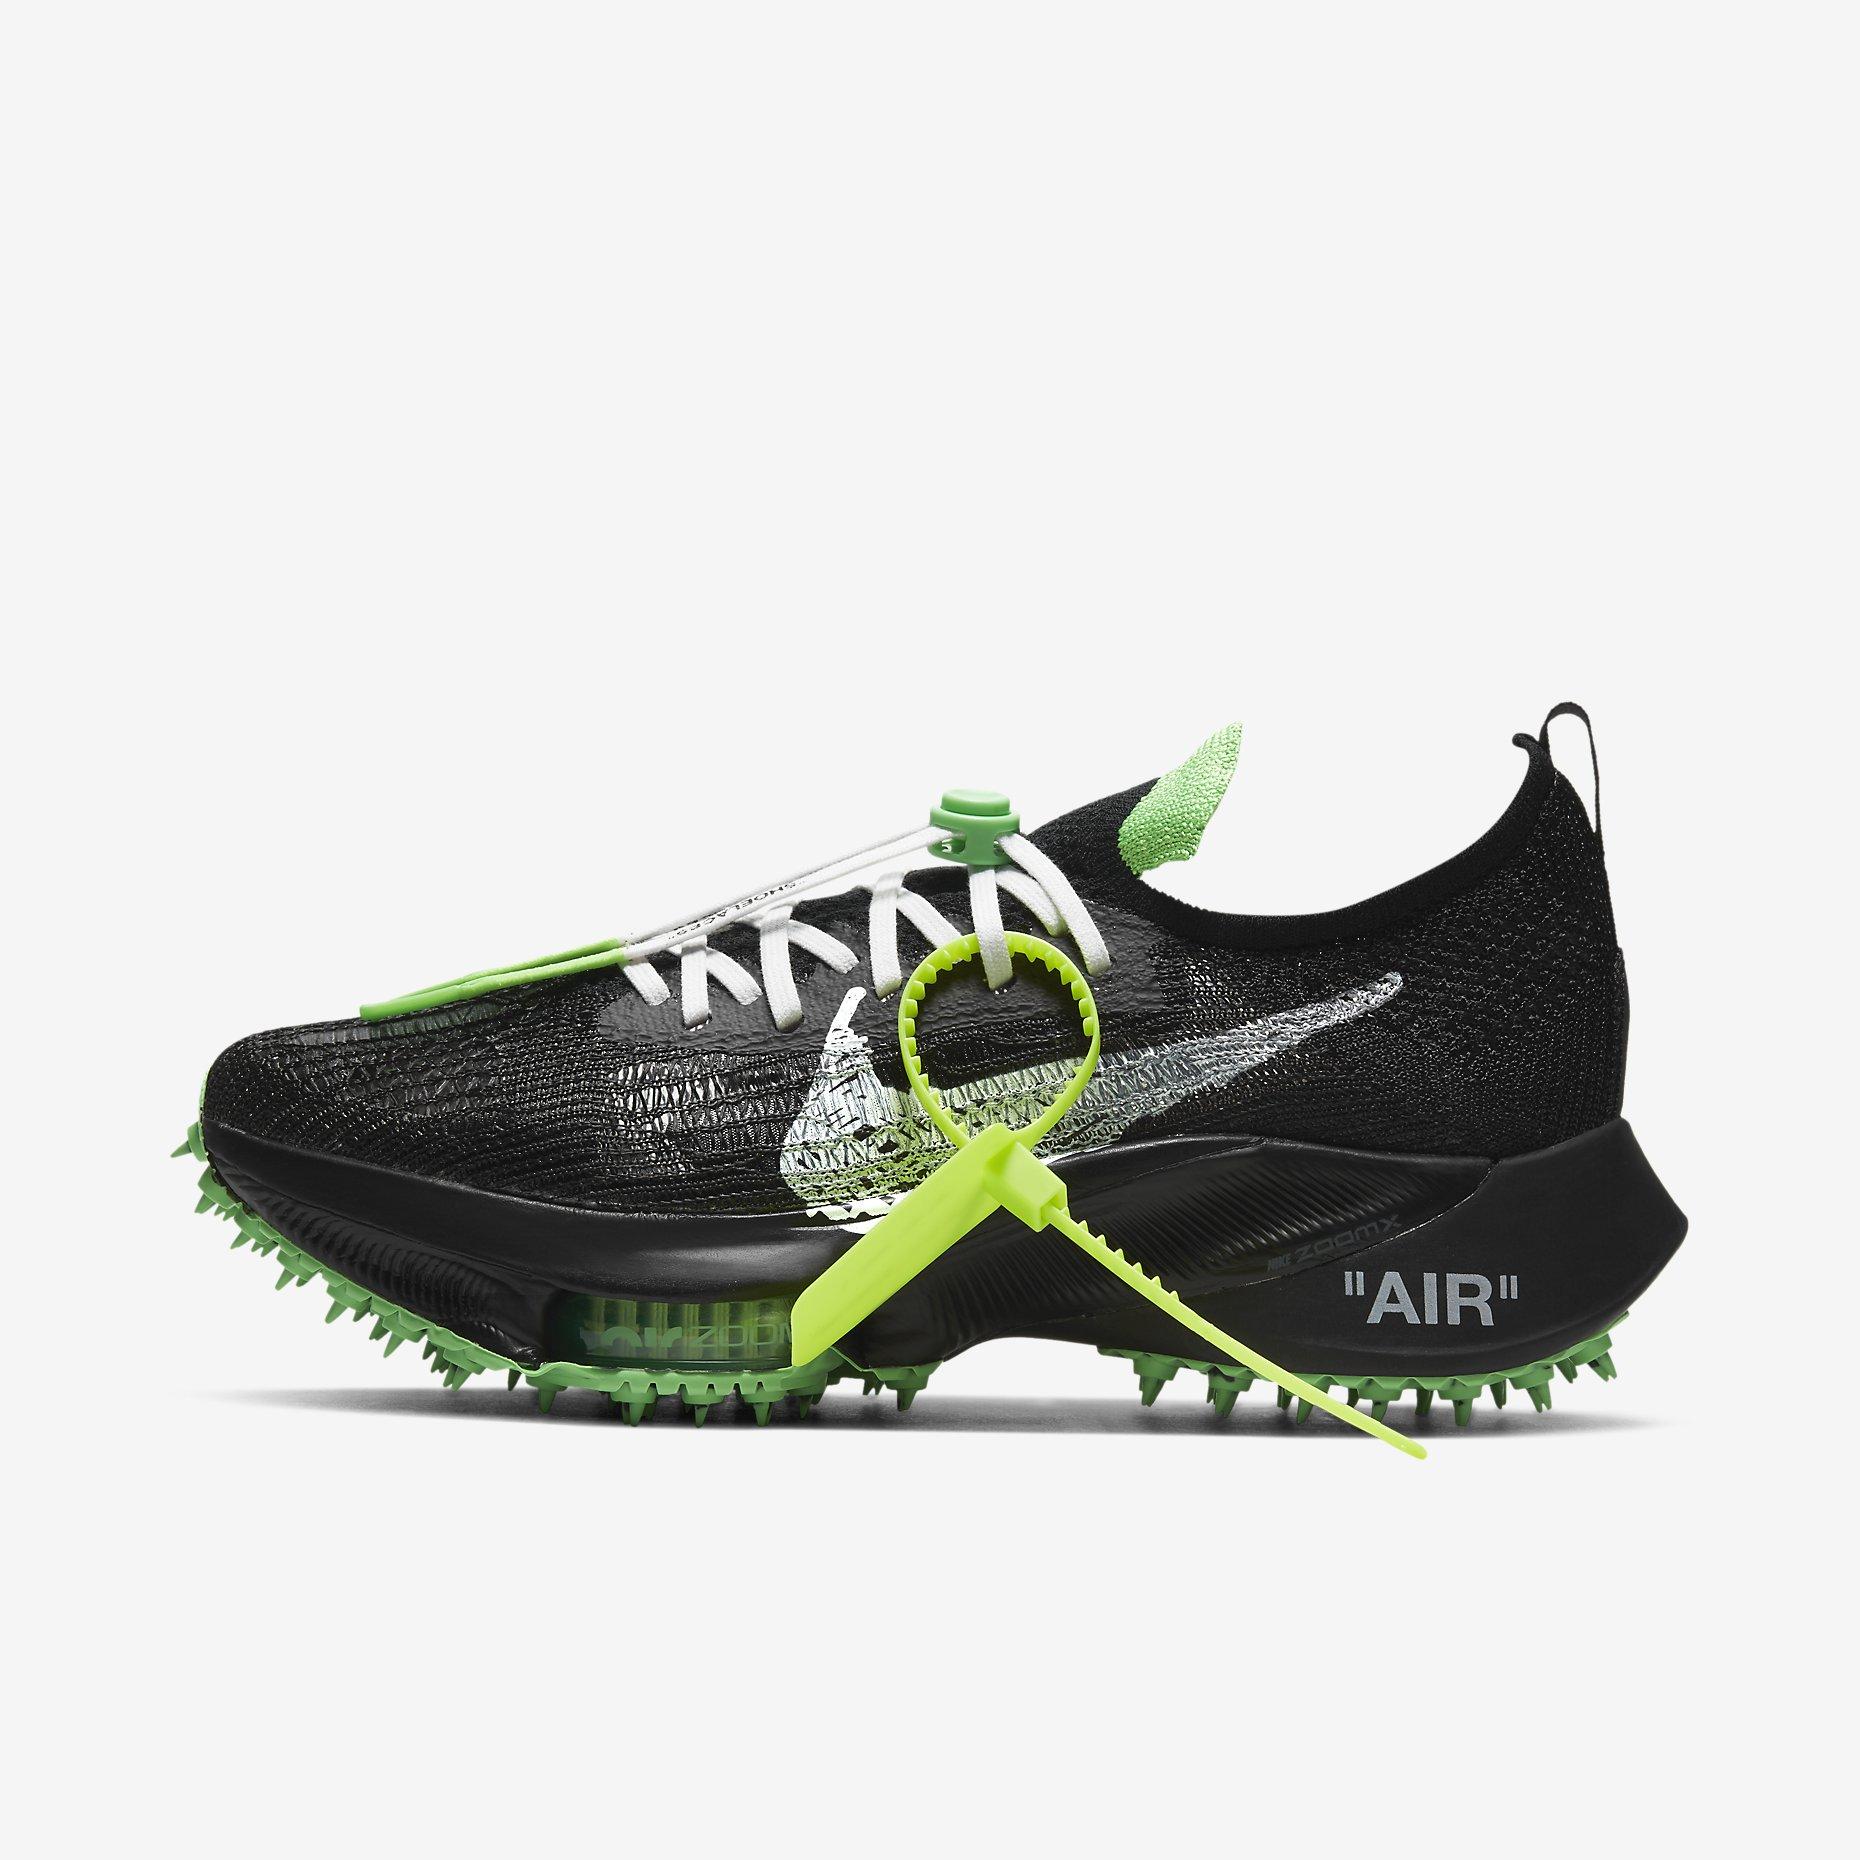 Off-White x Nike Air Zoom Tempo NEXT% 'Black Scream Green'